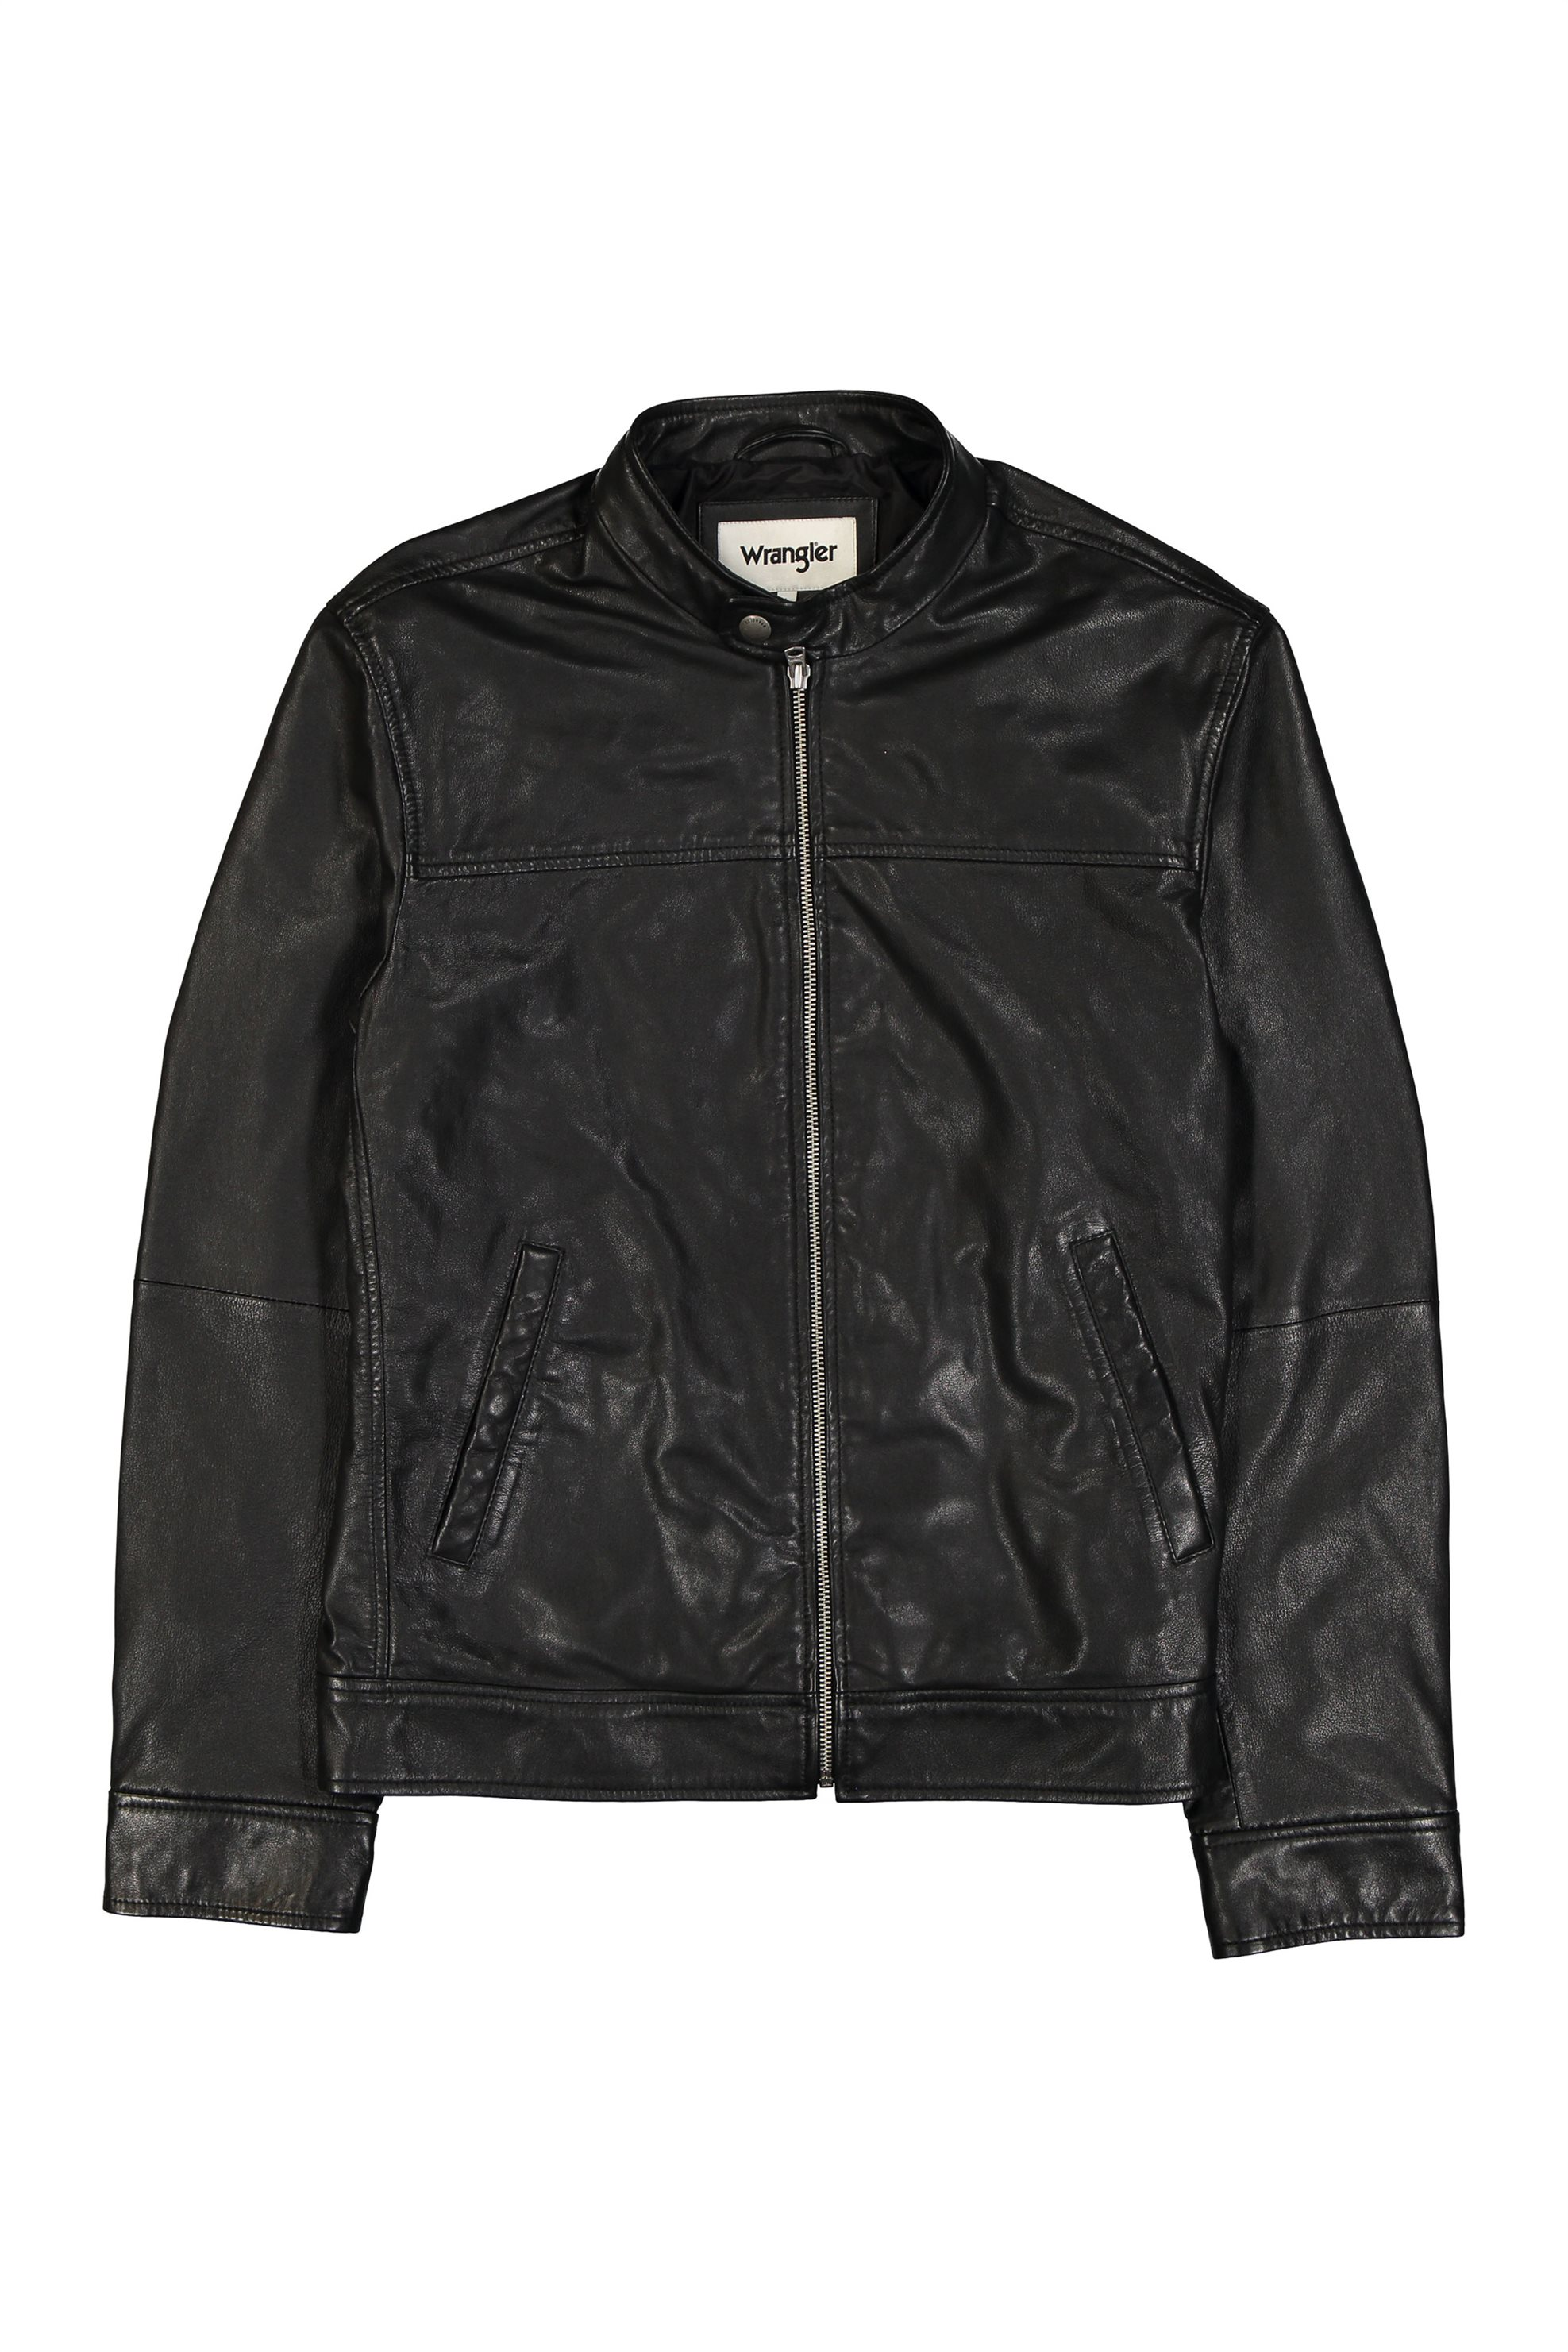 Wrangler ανδρικό biker μπουφάν Leather Biker Black - W4761ZC01 - Μαύρο 4fcbce4e72f